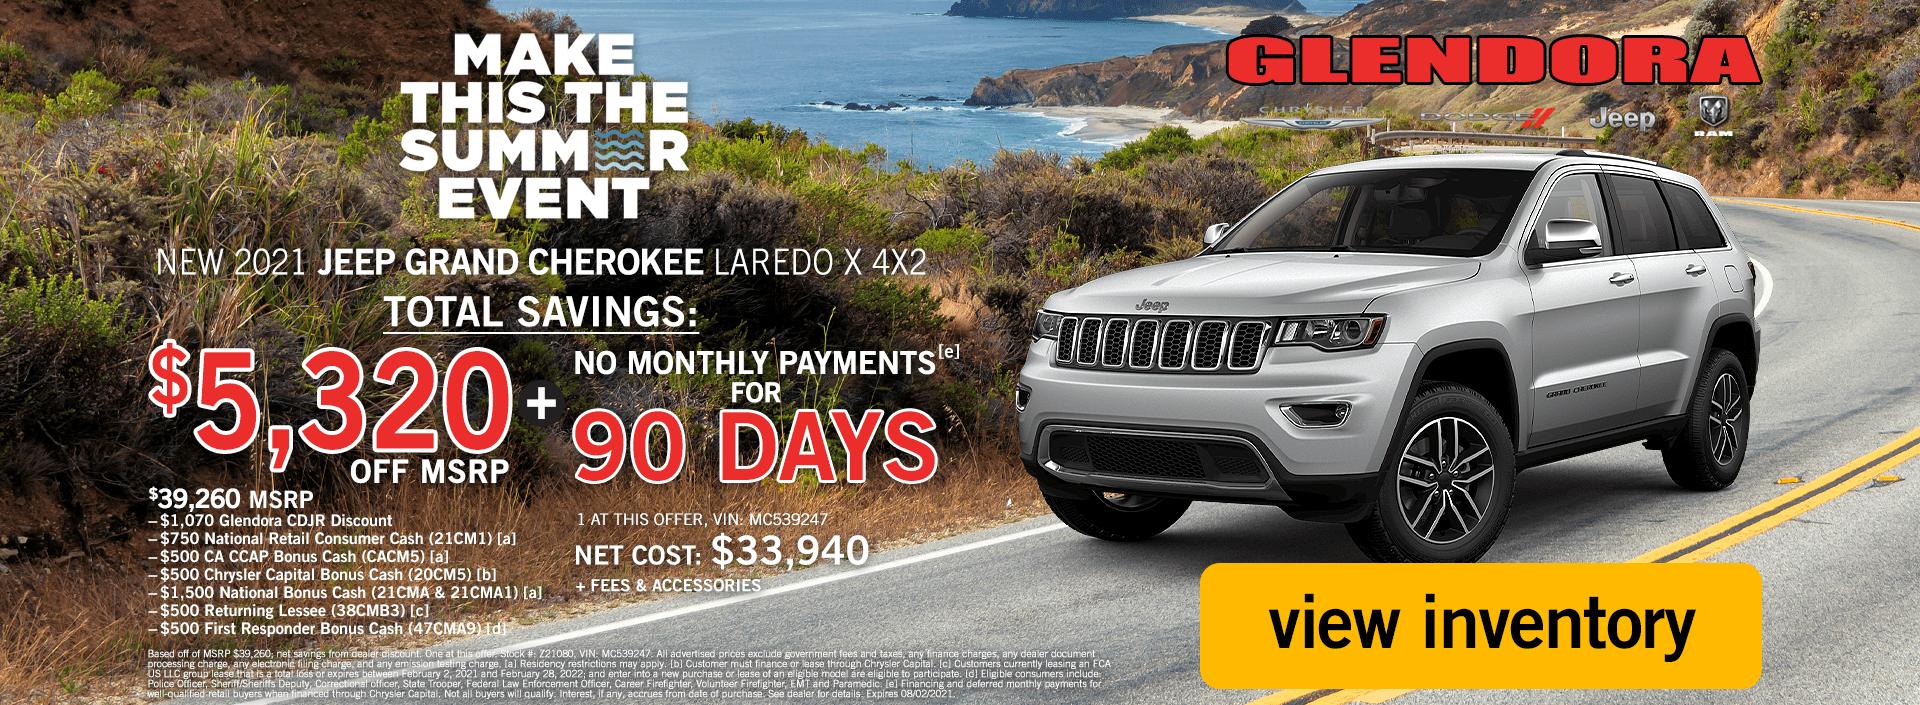 Jeep Grand Cherokee Deals July 2021